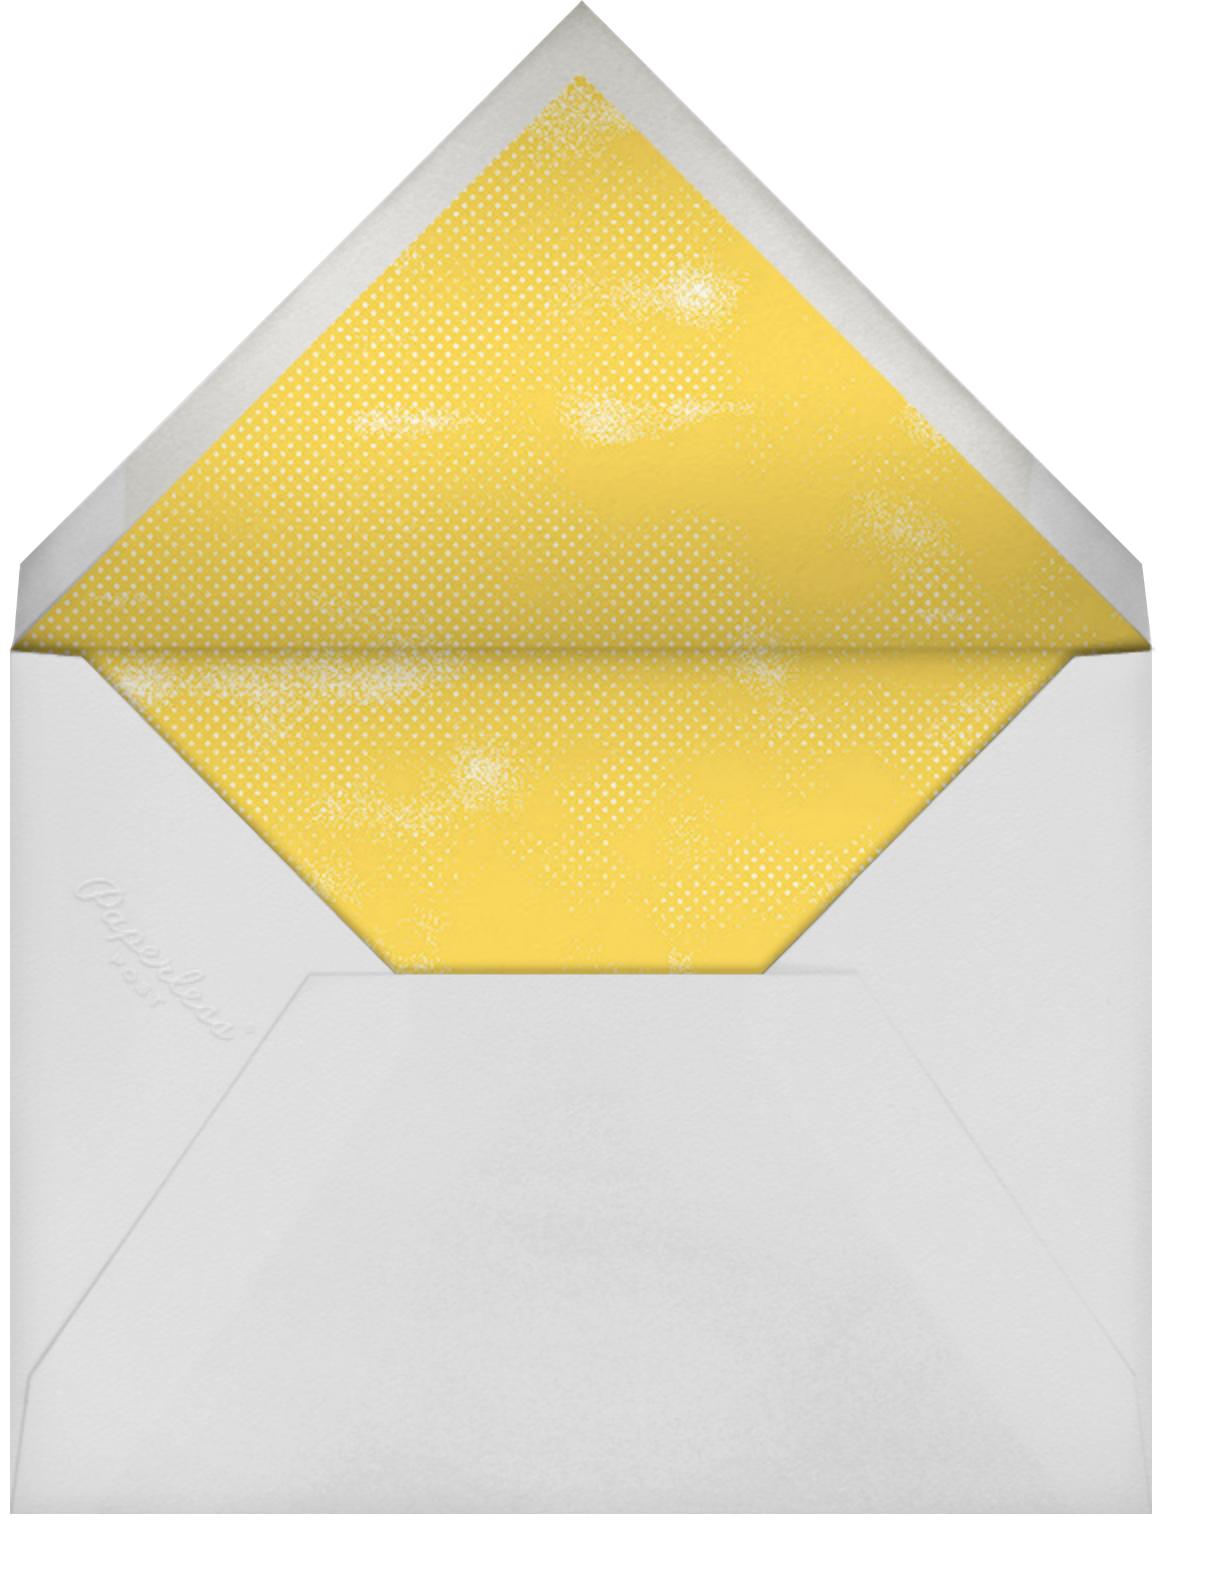 The Symbol Life - Rose Gold - Paperless Post - Baby shower - envelope back